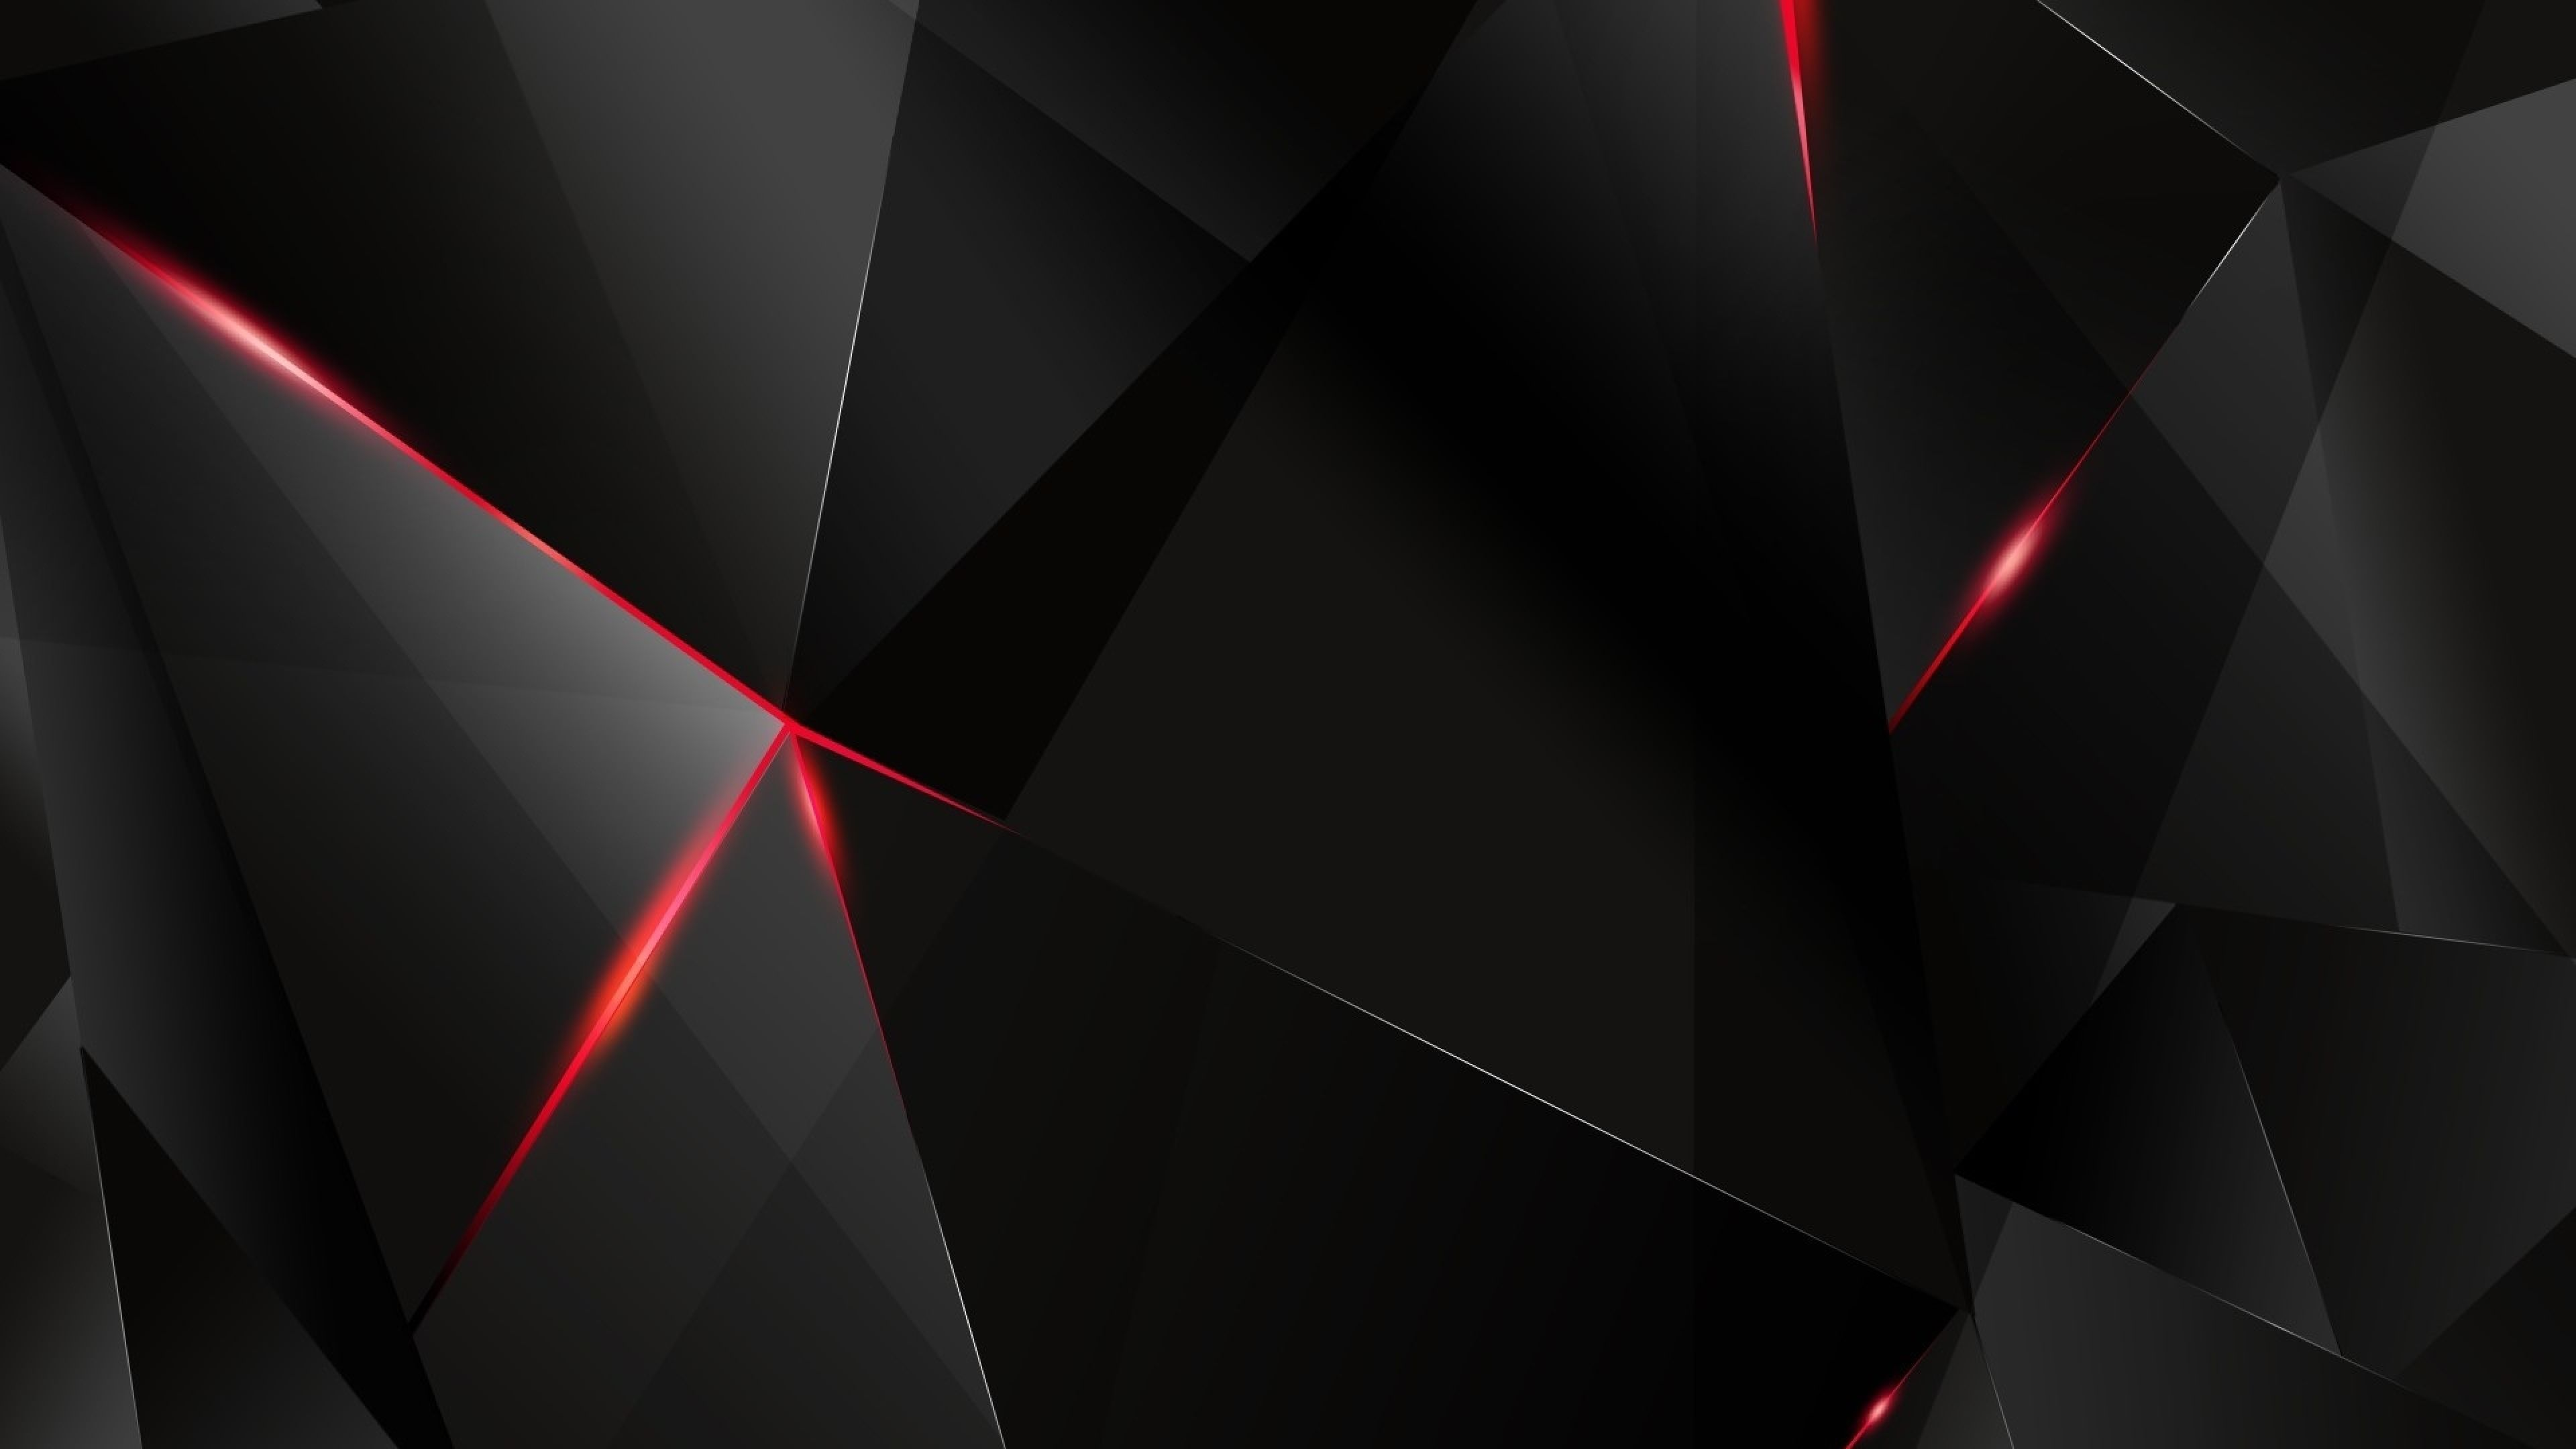 4k Black Wallpapers Top Free 4k Black Backgrounds